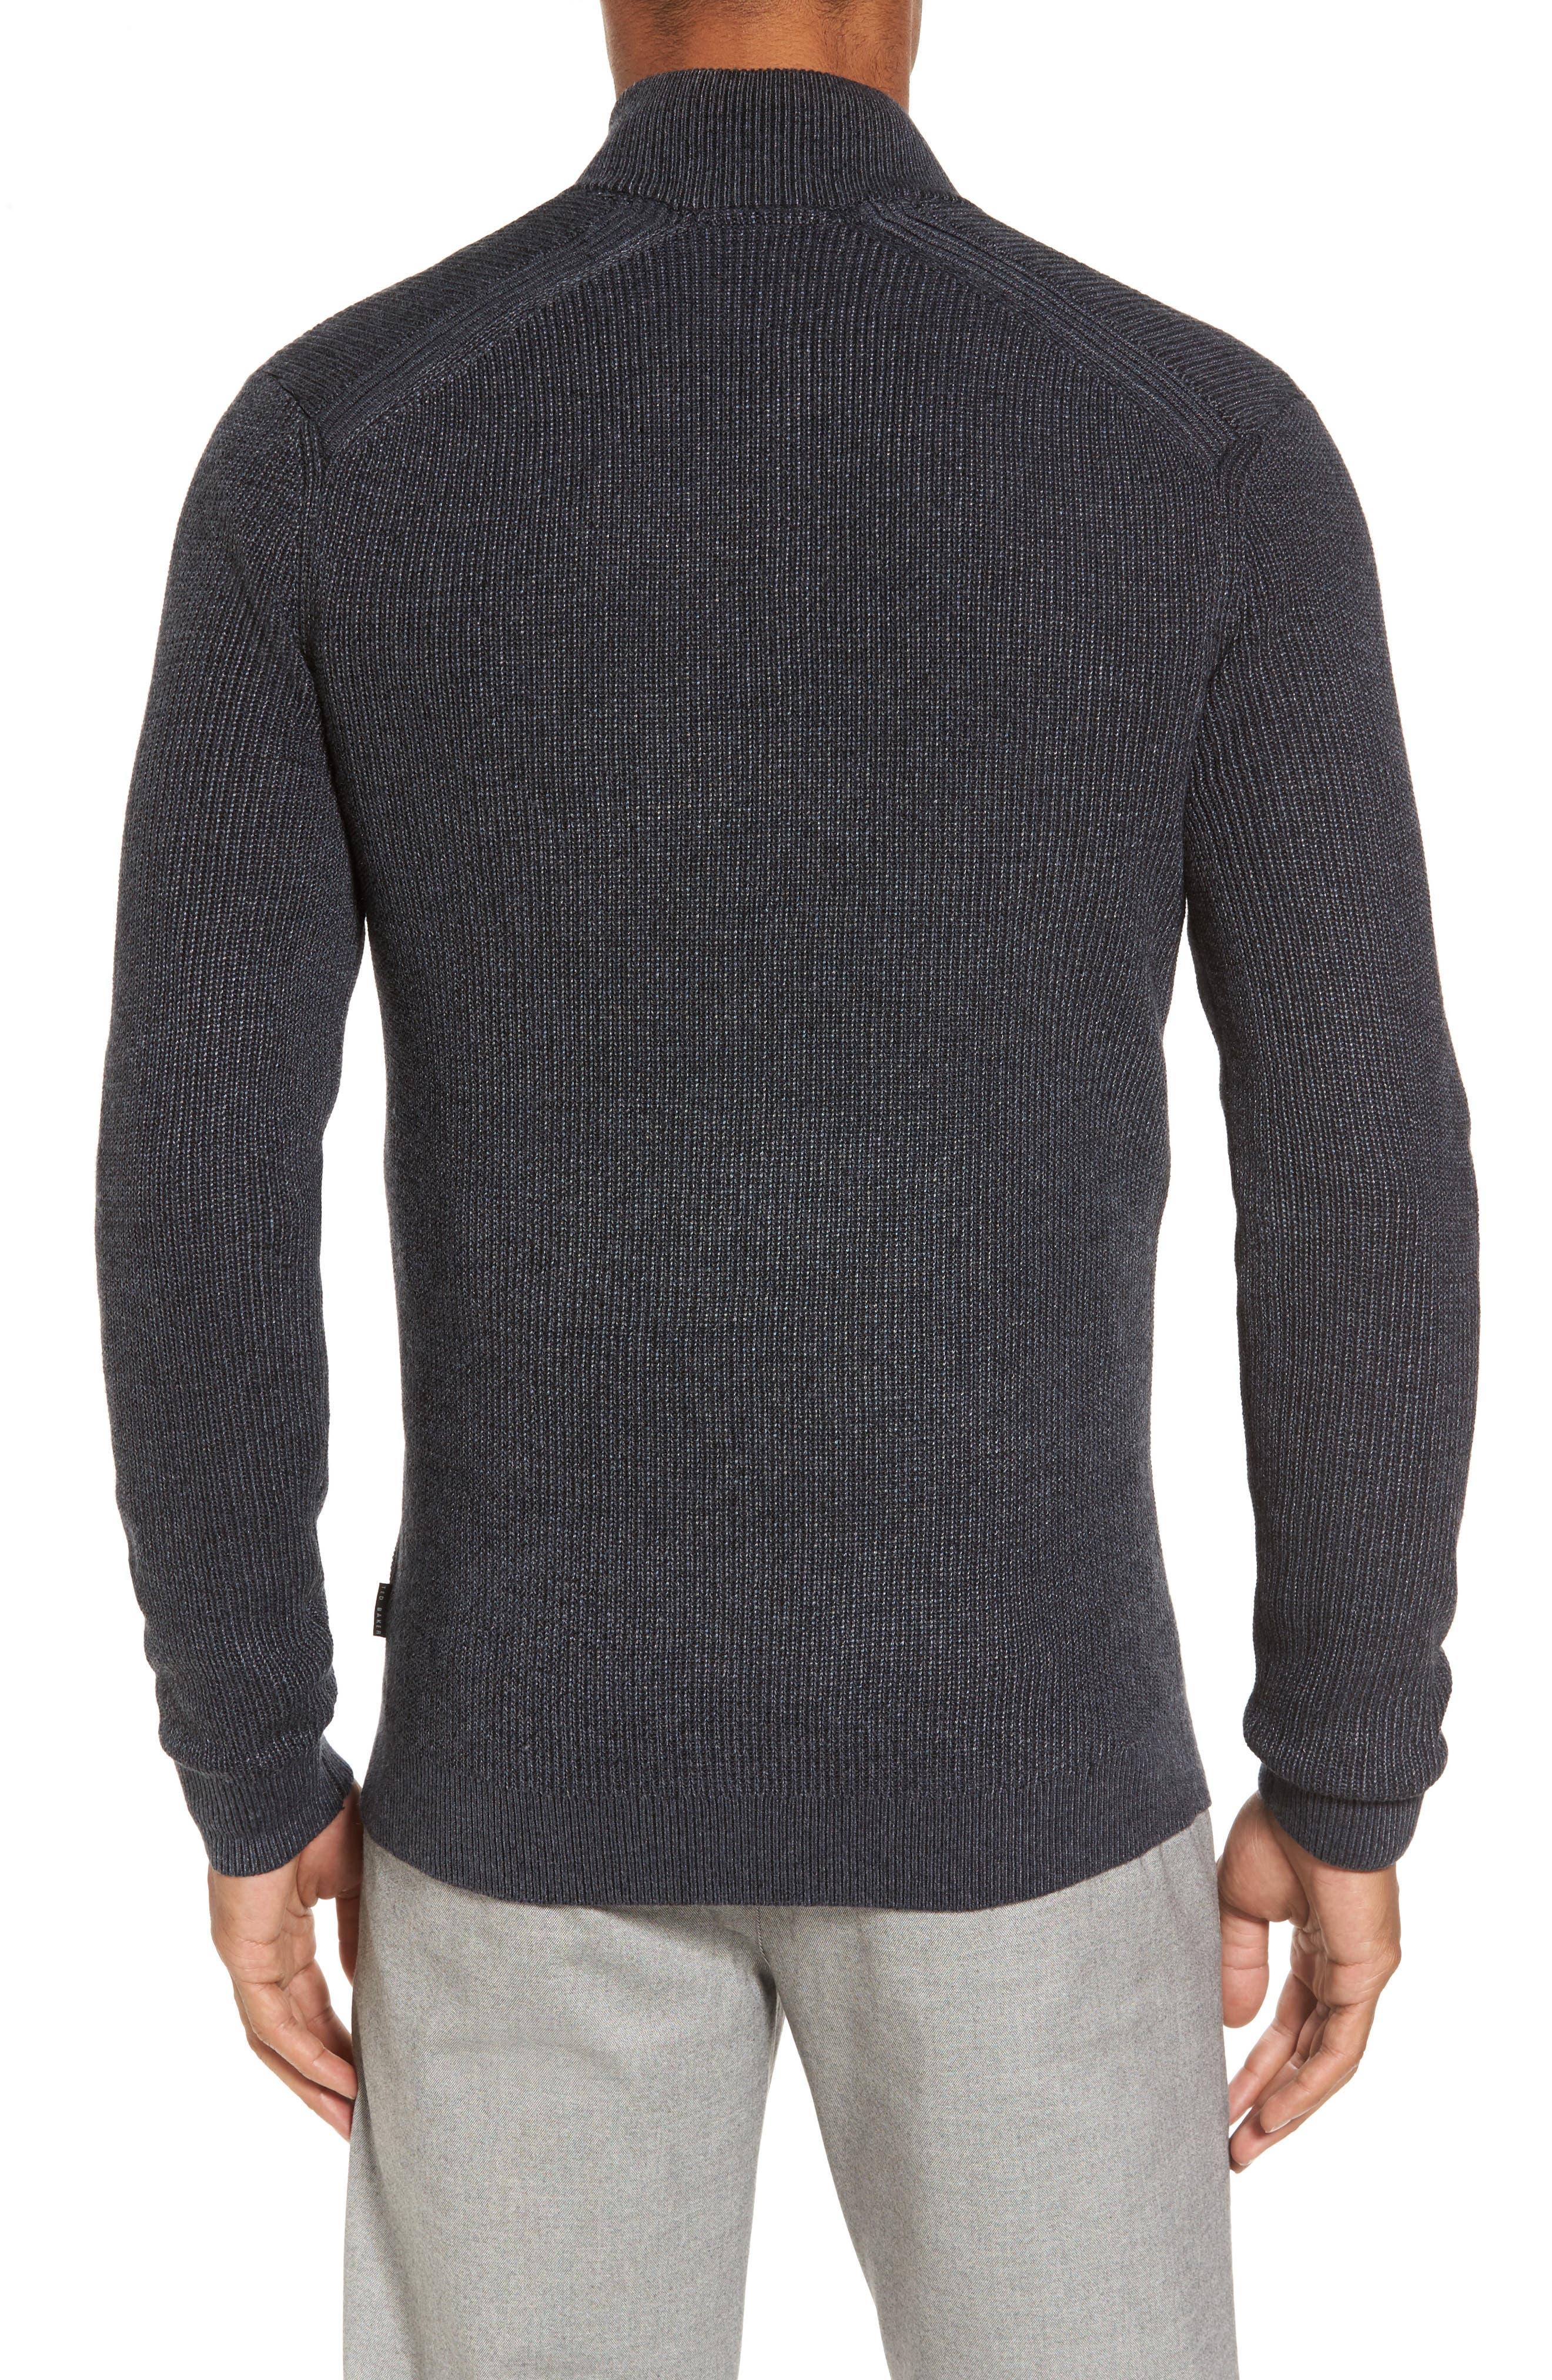 Stach Quarter Zip Sweater,                             Alternate thumbnail 2, color,                             010